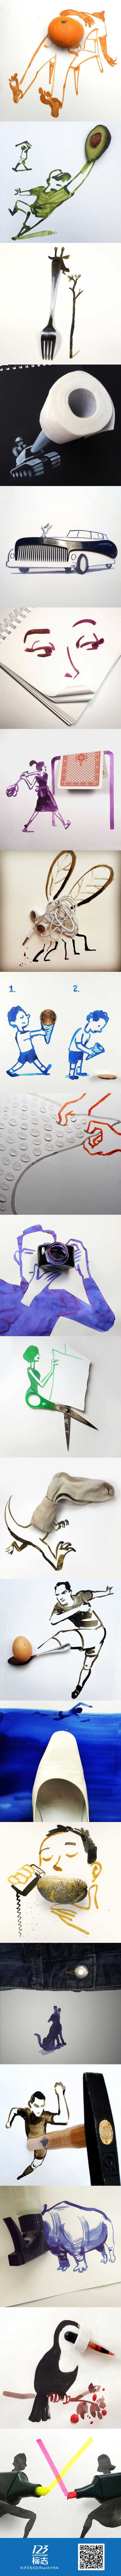 3D水彩创意趣味插画欣赏